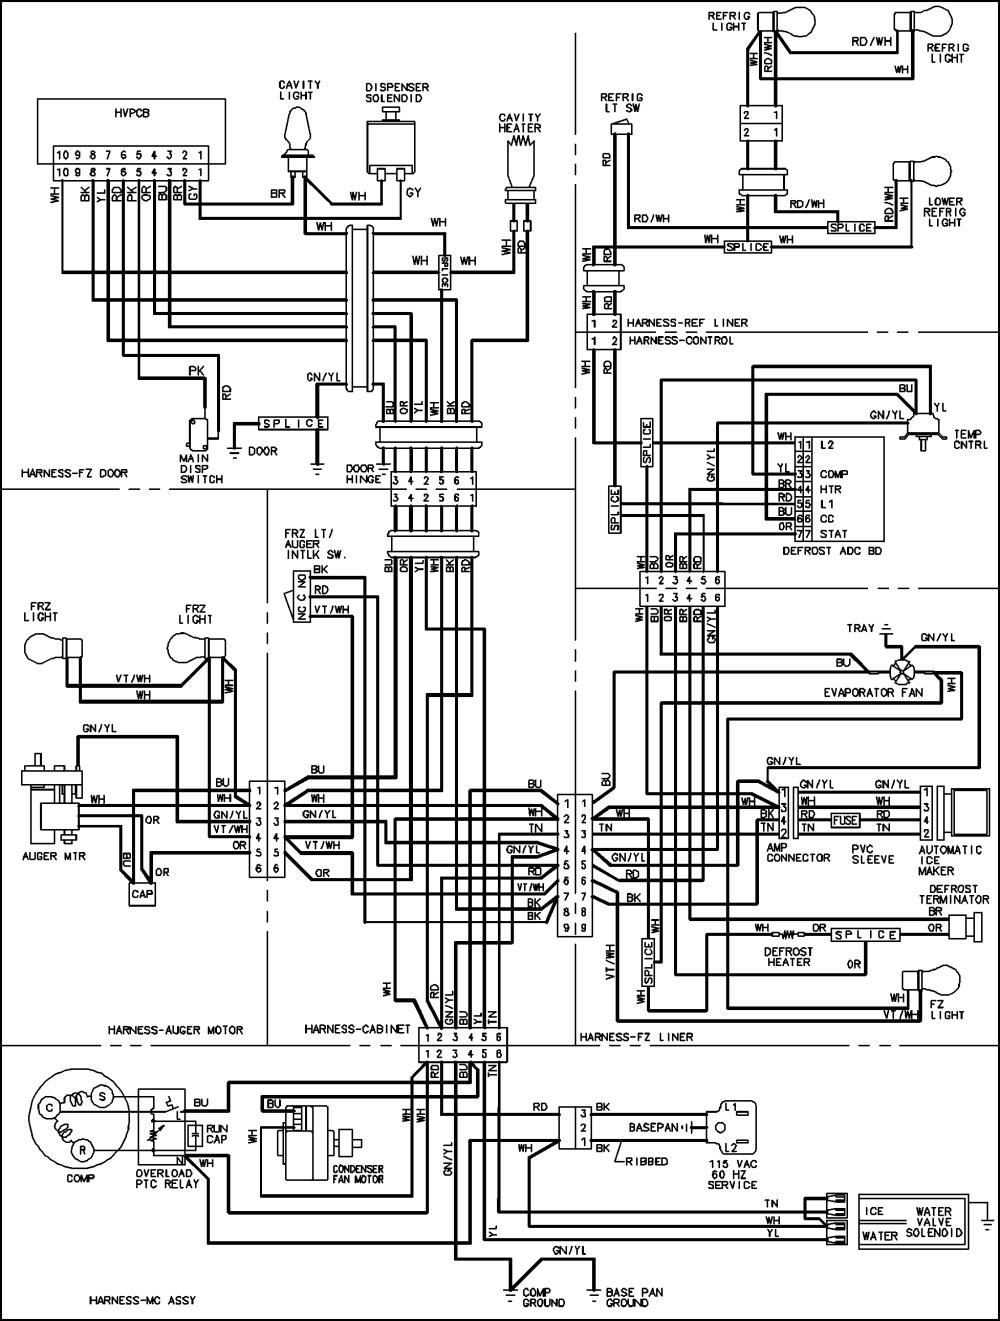 medium resolution of heatcraft ph condenser wiring diagram heatcraft printable refrigeration condensing unit wiring diagram nissan rogue stereo source